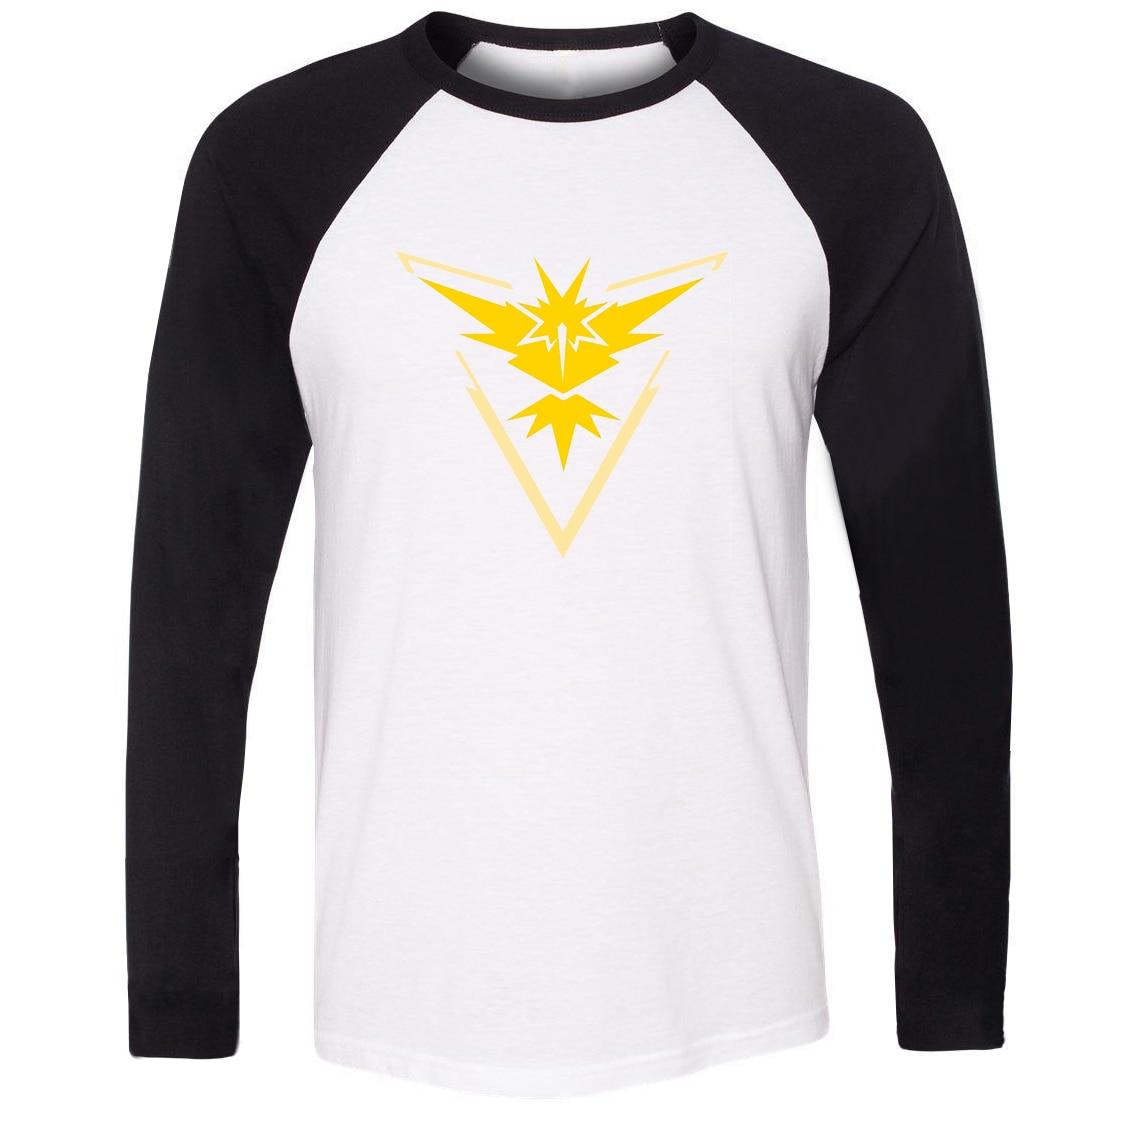 New Hot Unisex T-shirt Pokemon Go Game Fans Zapdos Team Yellow Team Pattern Raglan Long Sleeve Men T shirt Boy print Tee Tops